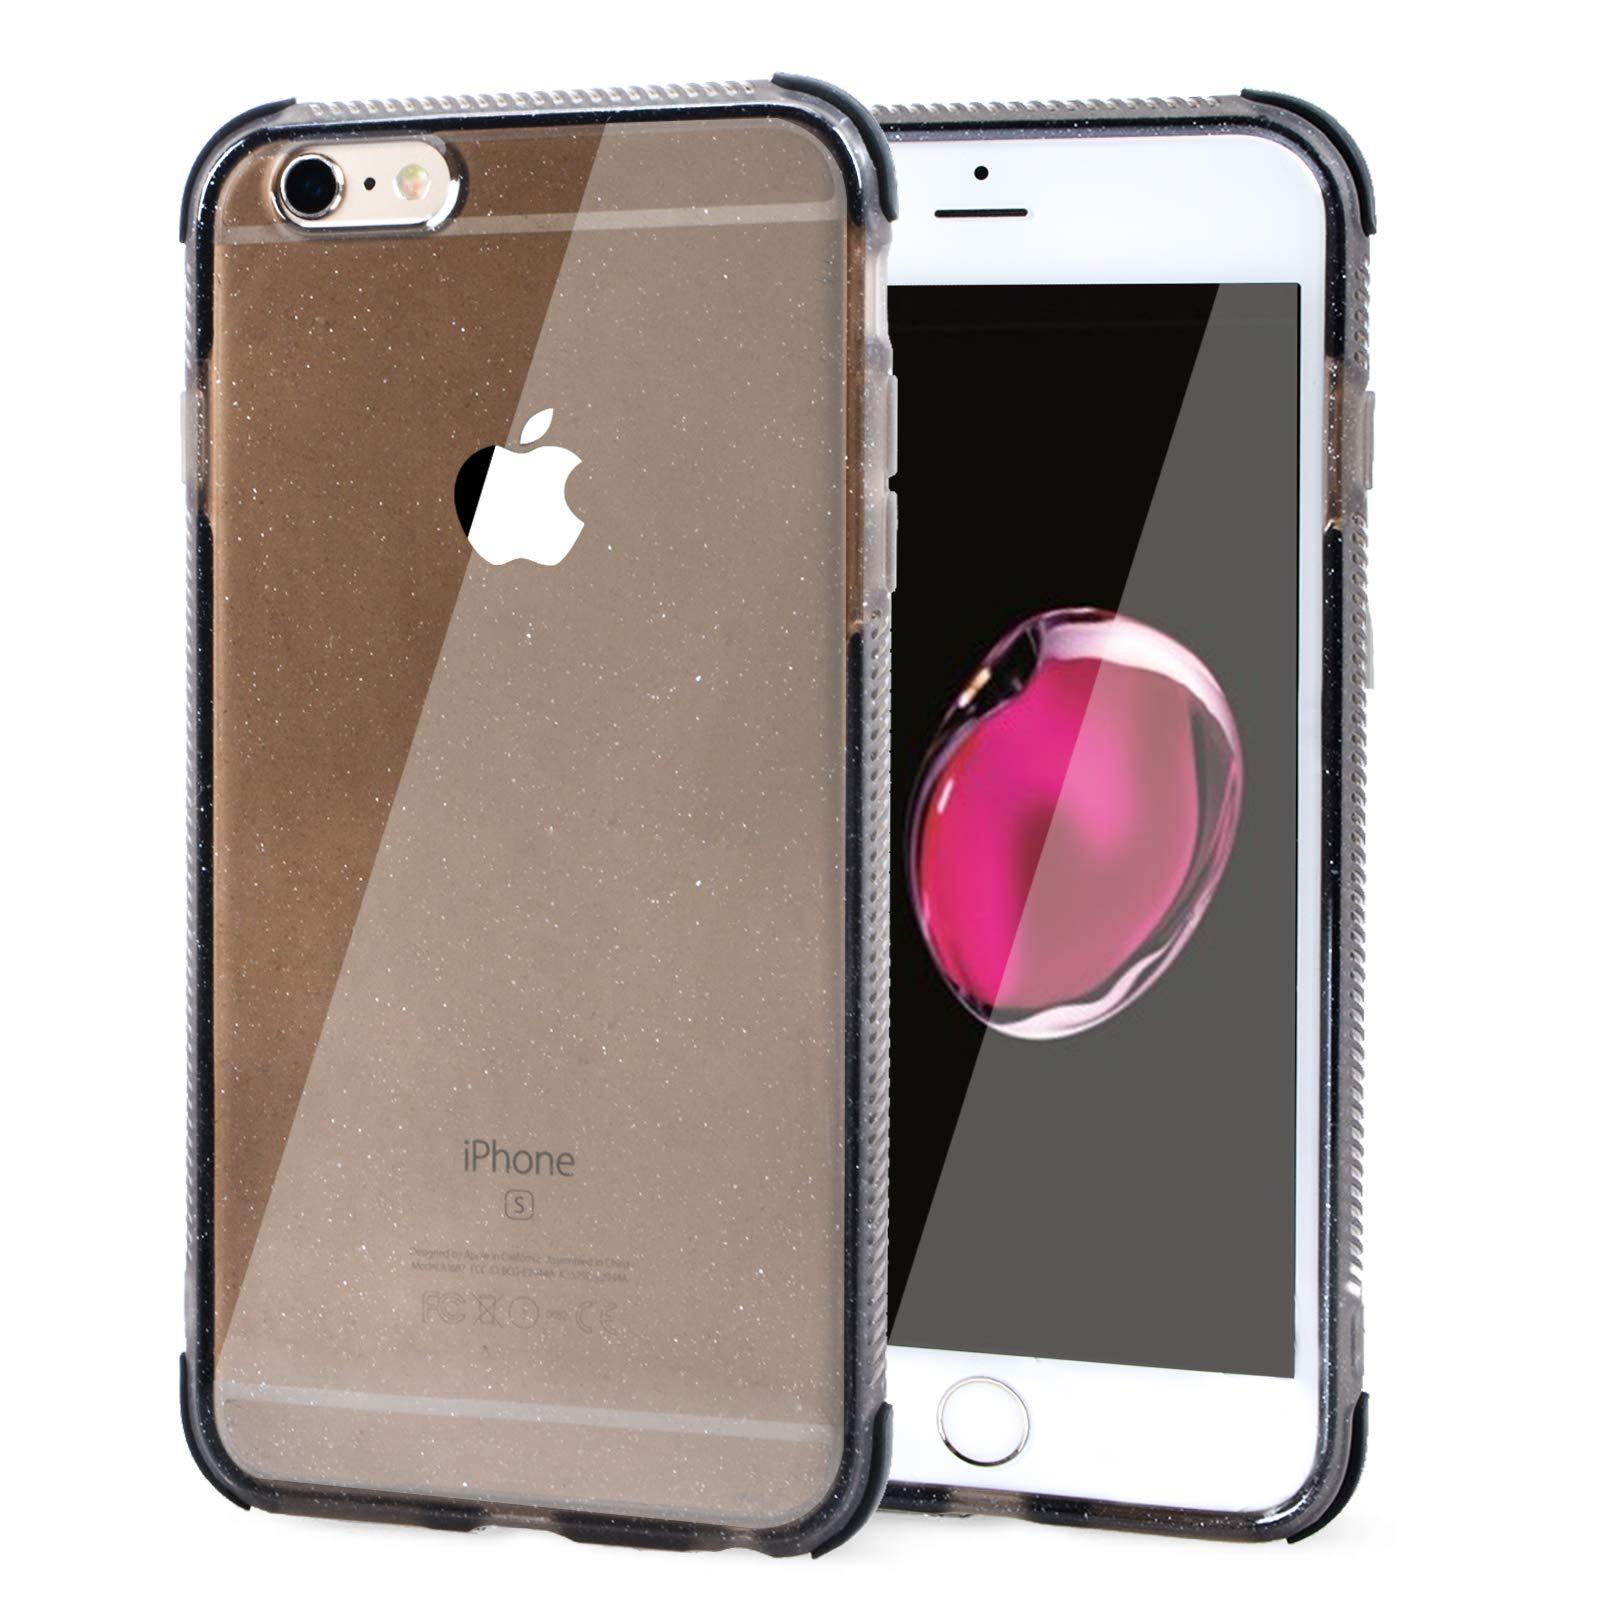 Voilamart iPhone 6 Plus Case, iPhone 6s Plus Case Bling Shiny Cute Pattern Design Sparkle Glitter Anti-Slick/Protective Case for iPhone 6/6s Plus 5.5 Inch, Black